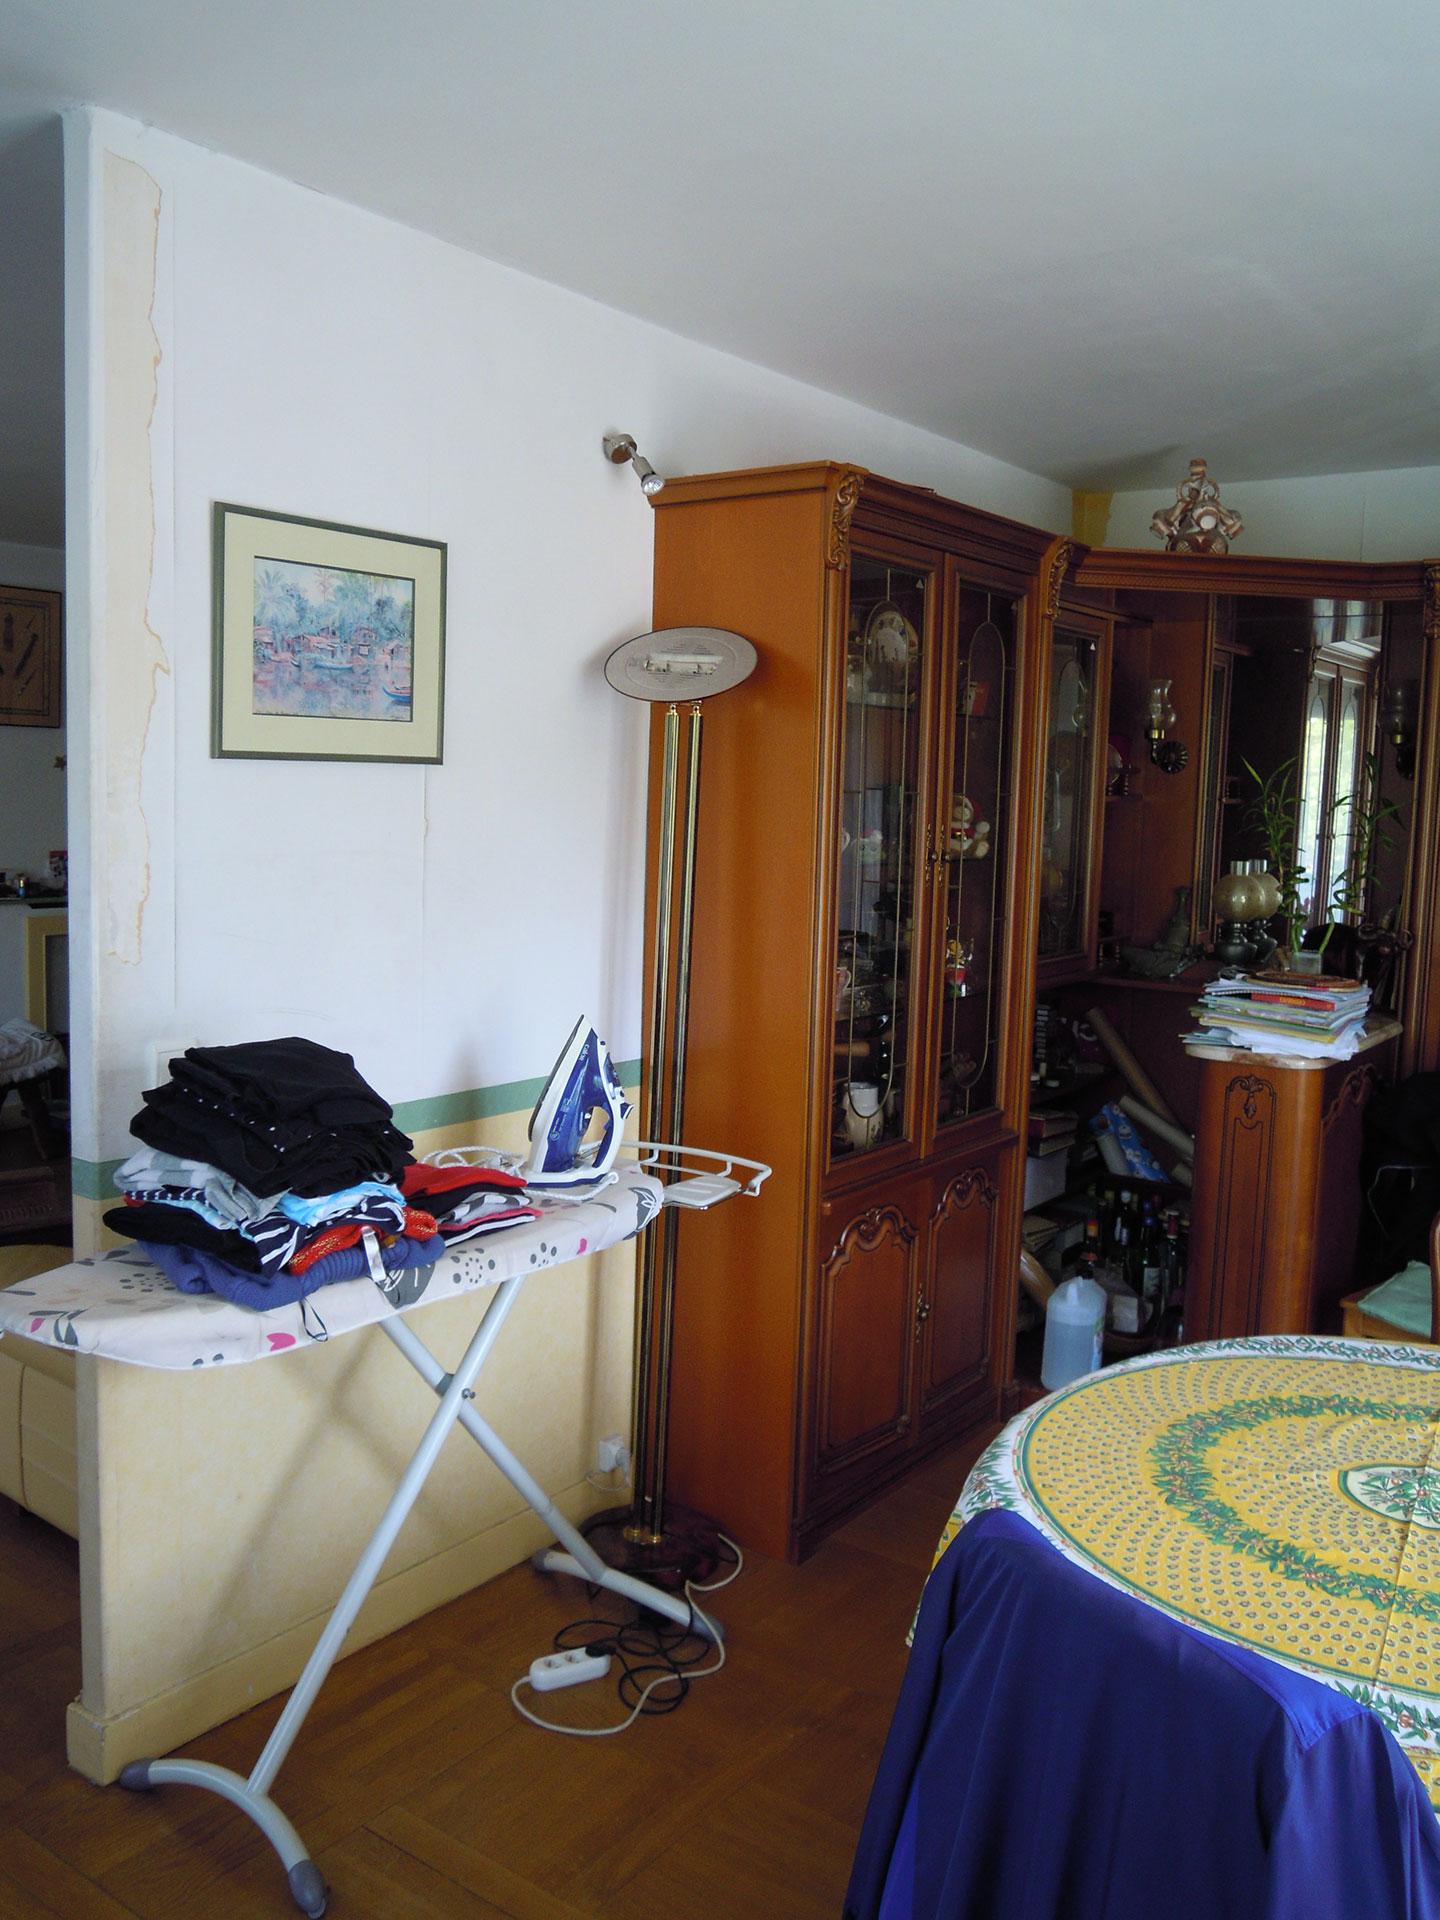 st-maur-interieur-1